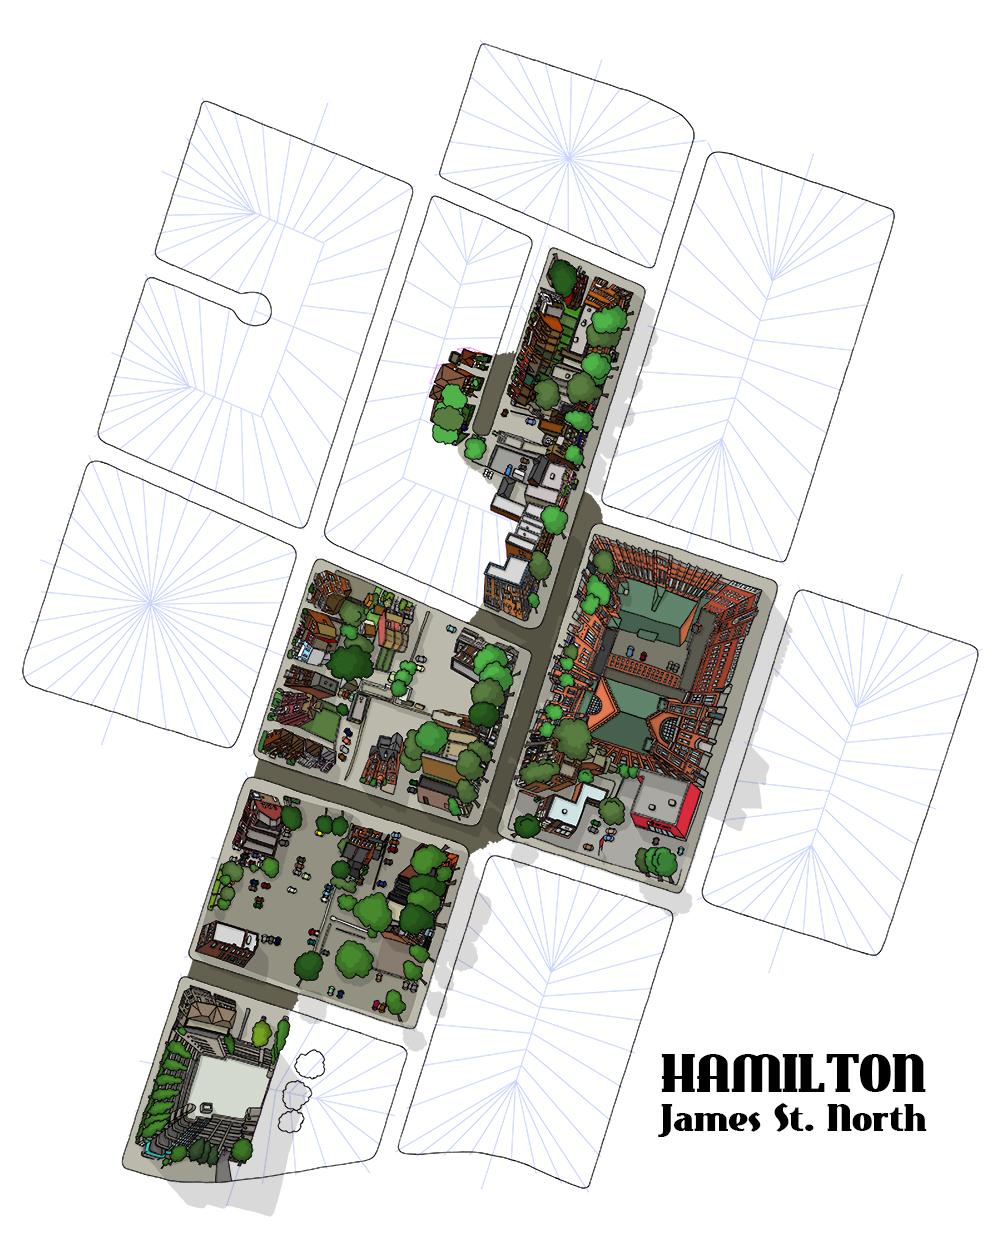 Hamilton James St North Map in Progress